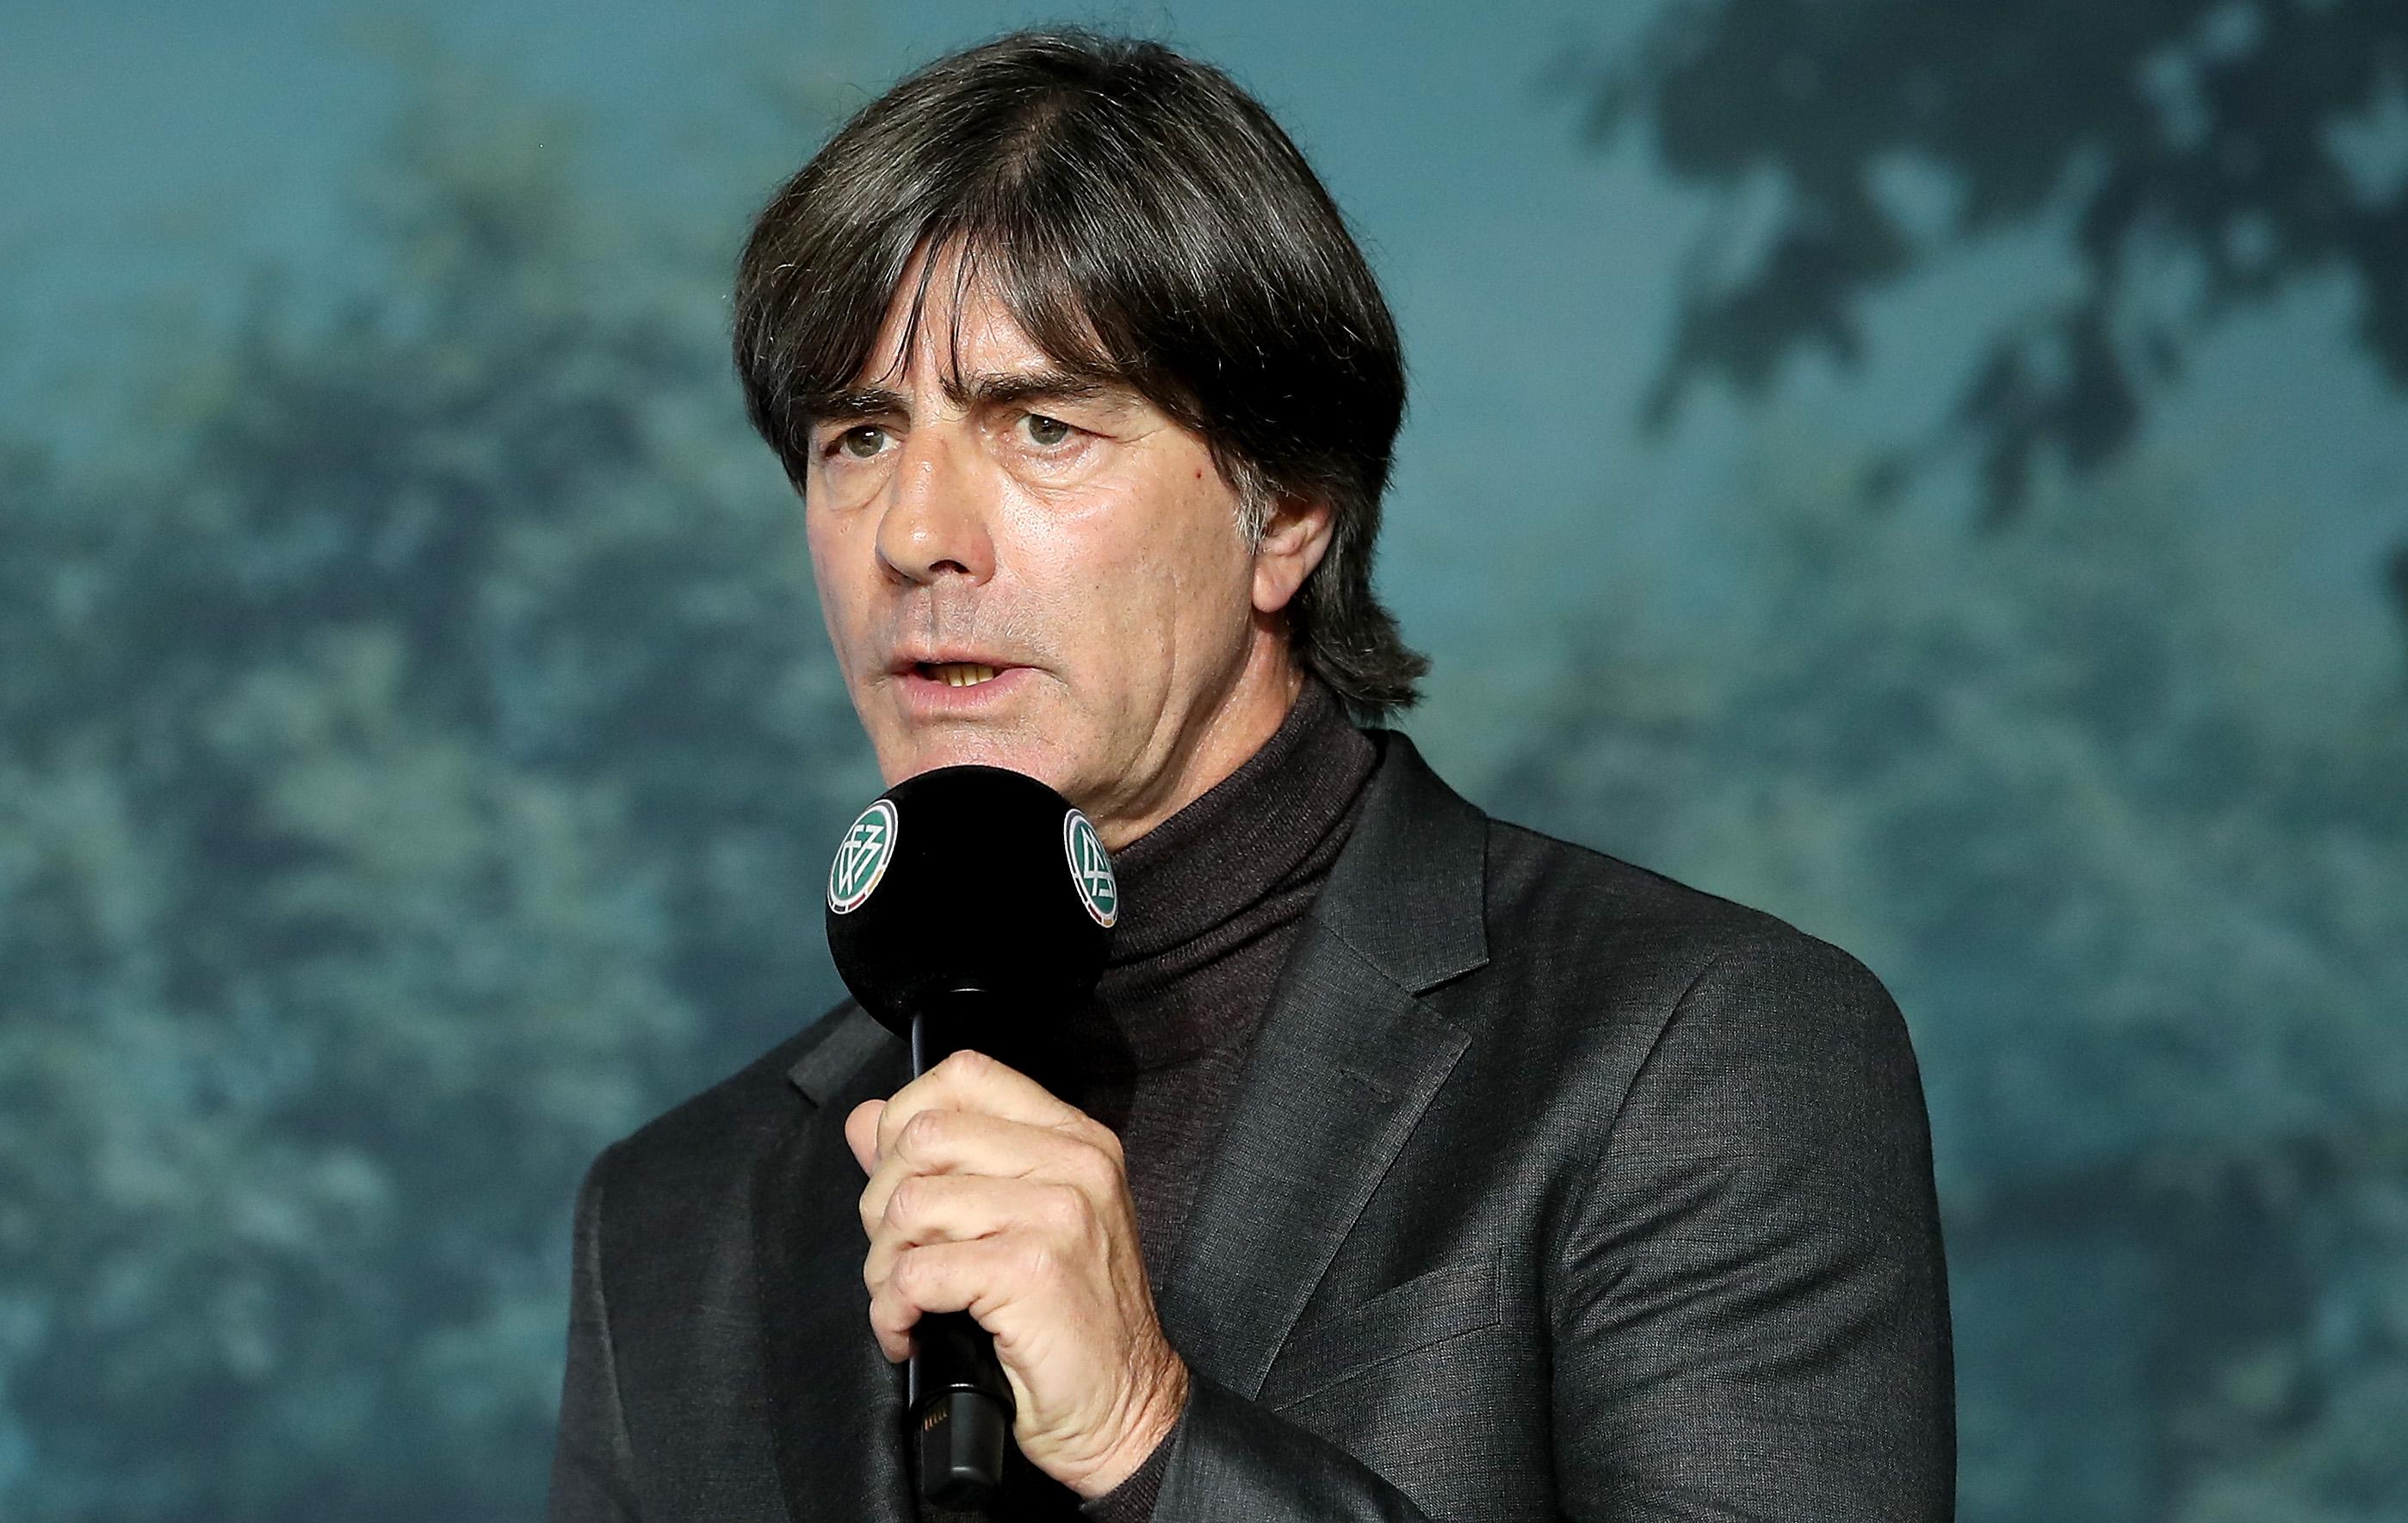 Селекционерът на германския национален отбор по футбол Йоахим Льов ще